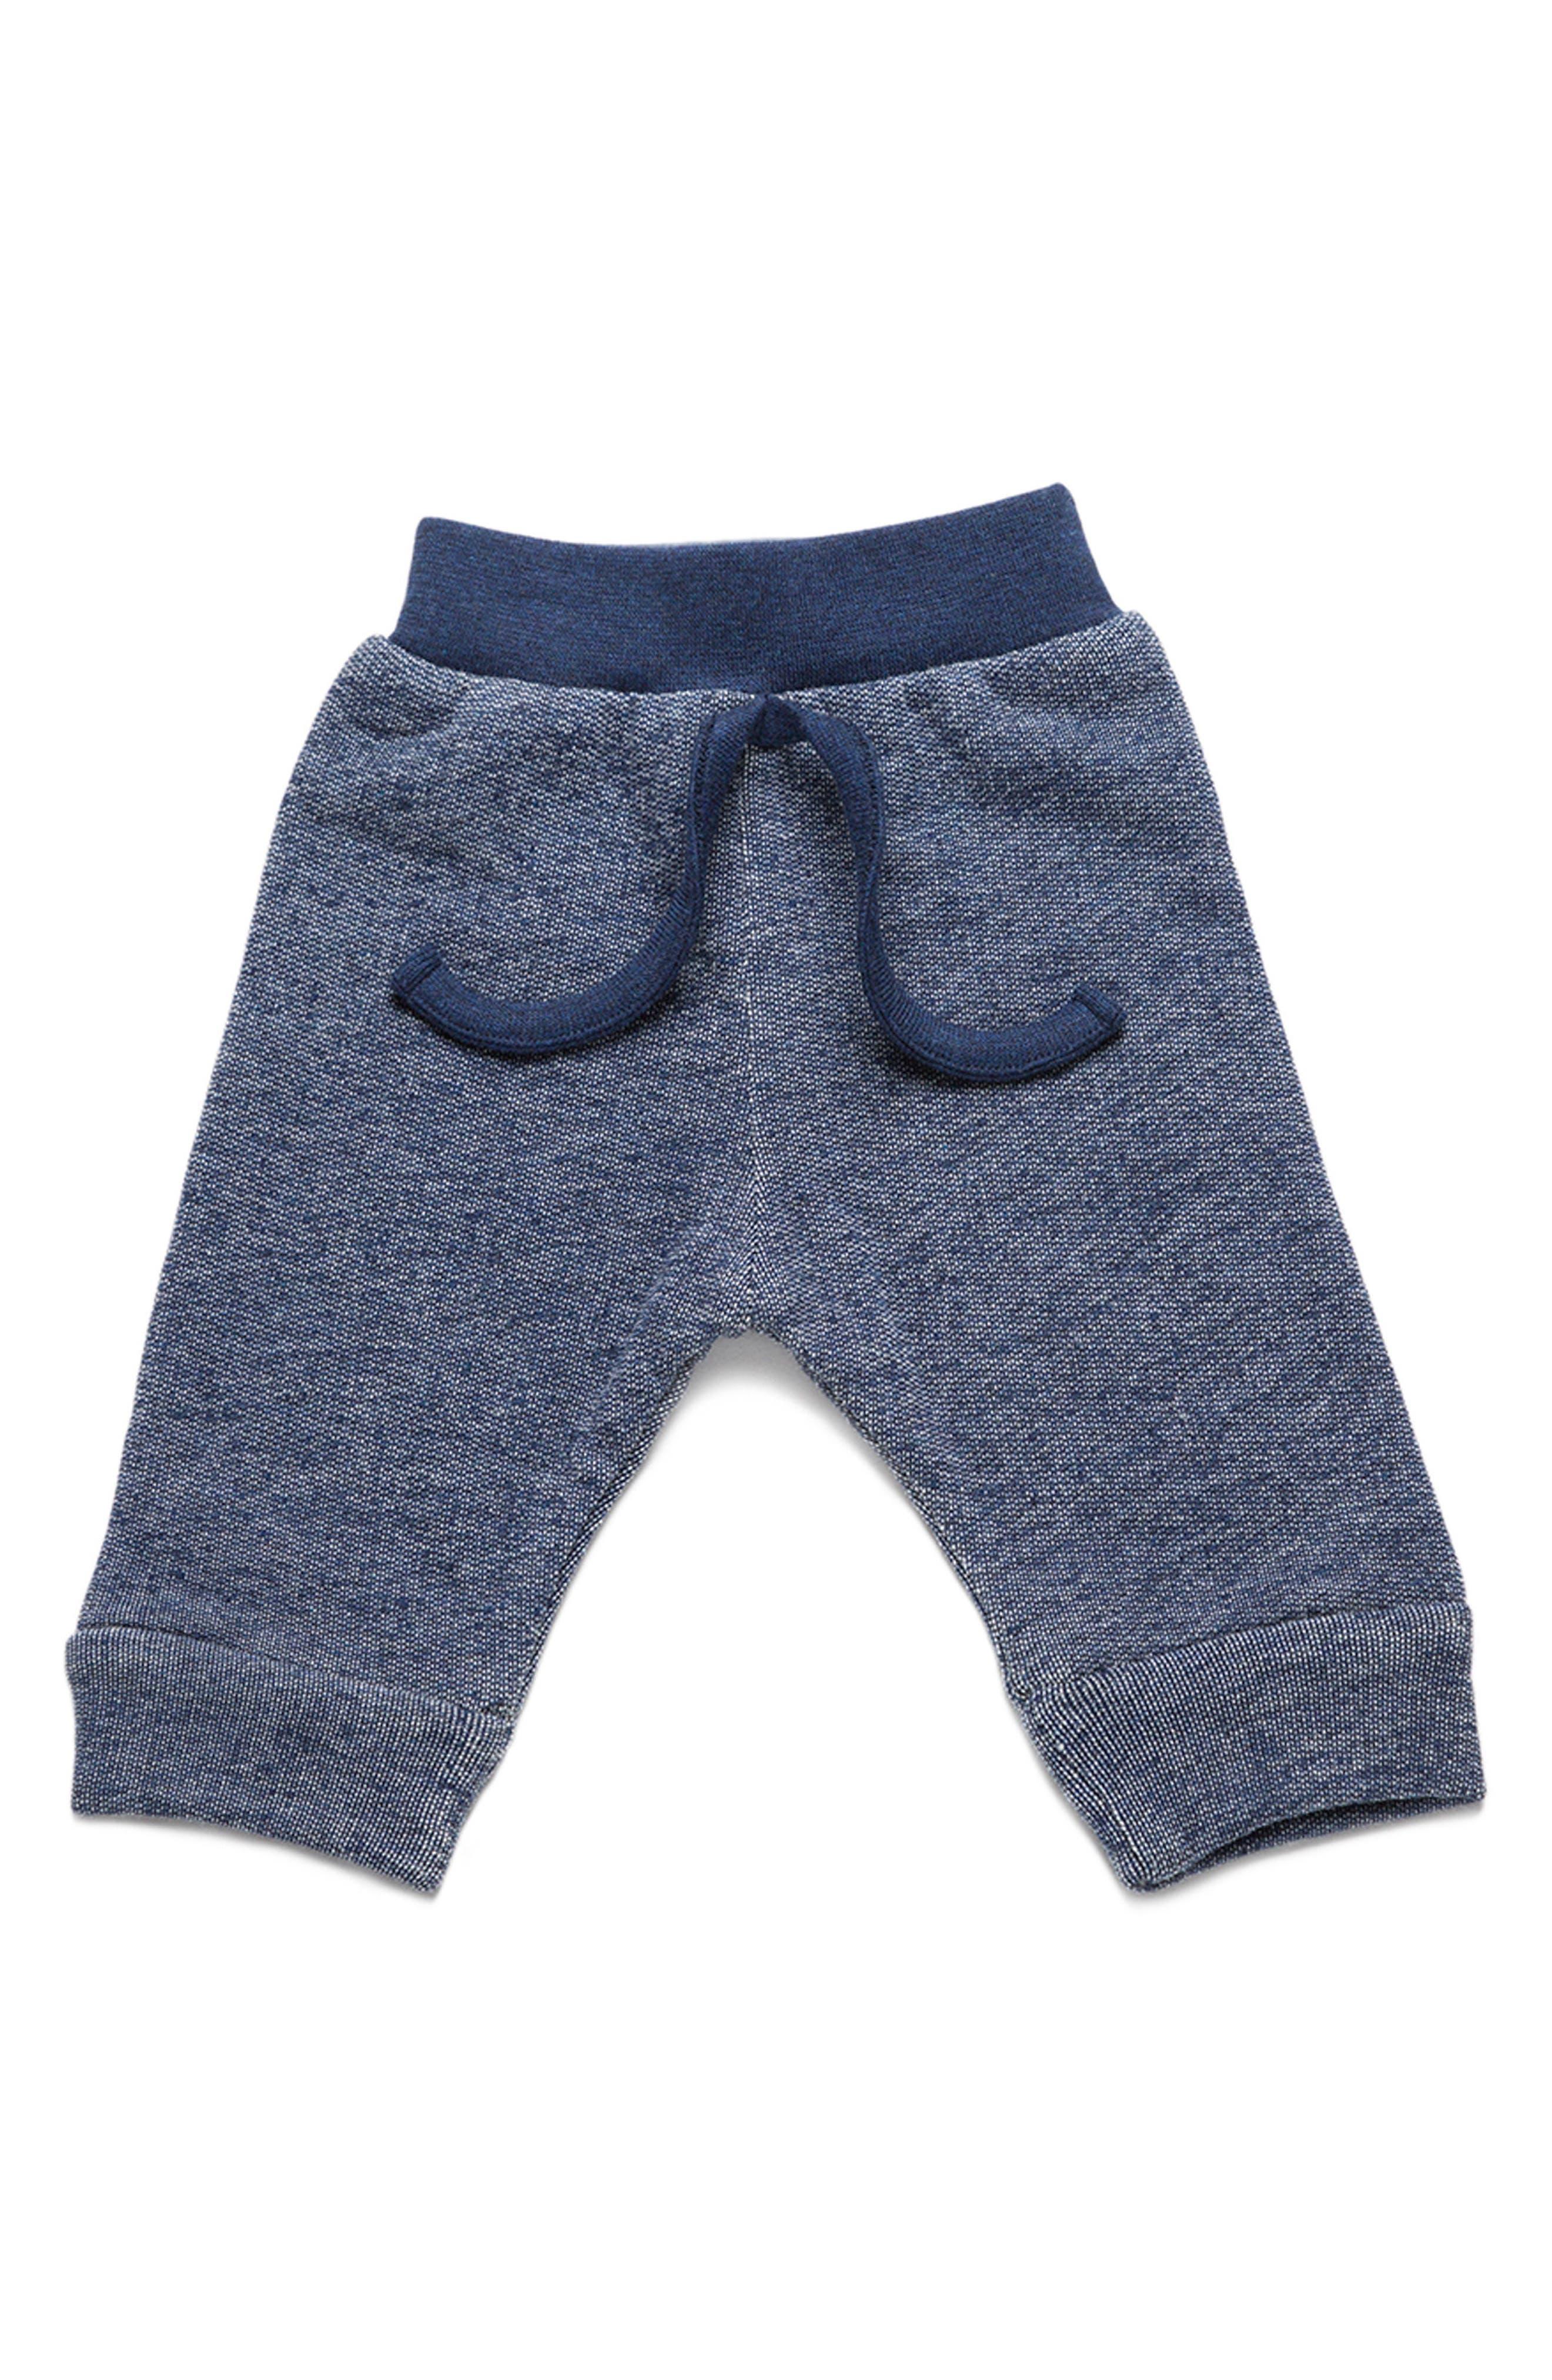 Main Image - Monica + Andy Organic Cotton Sweatpants (Baby Boys)